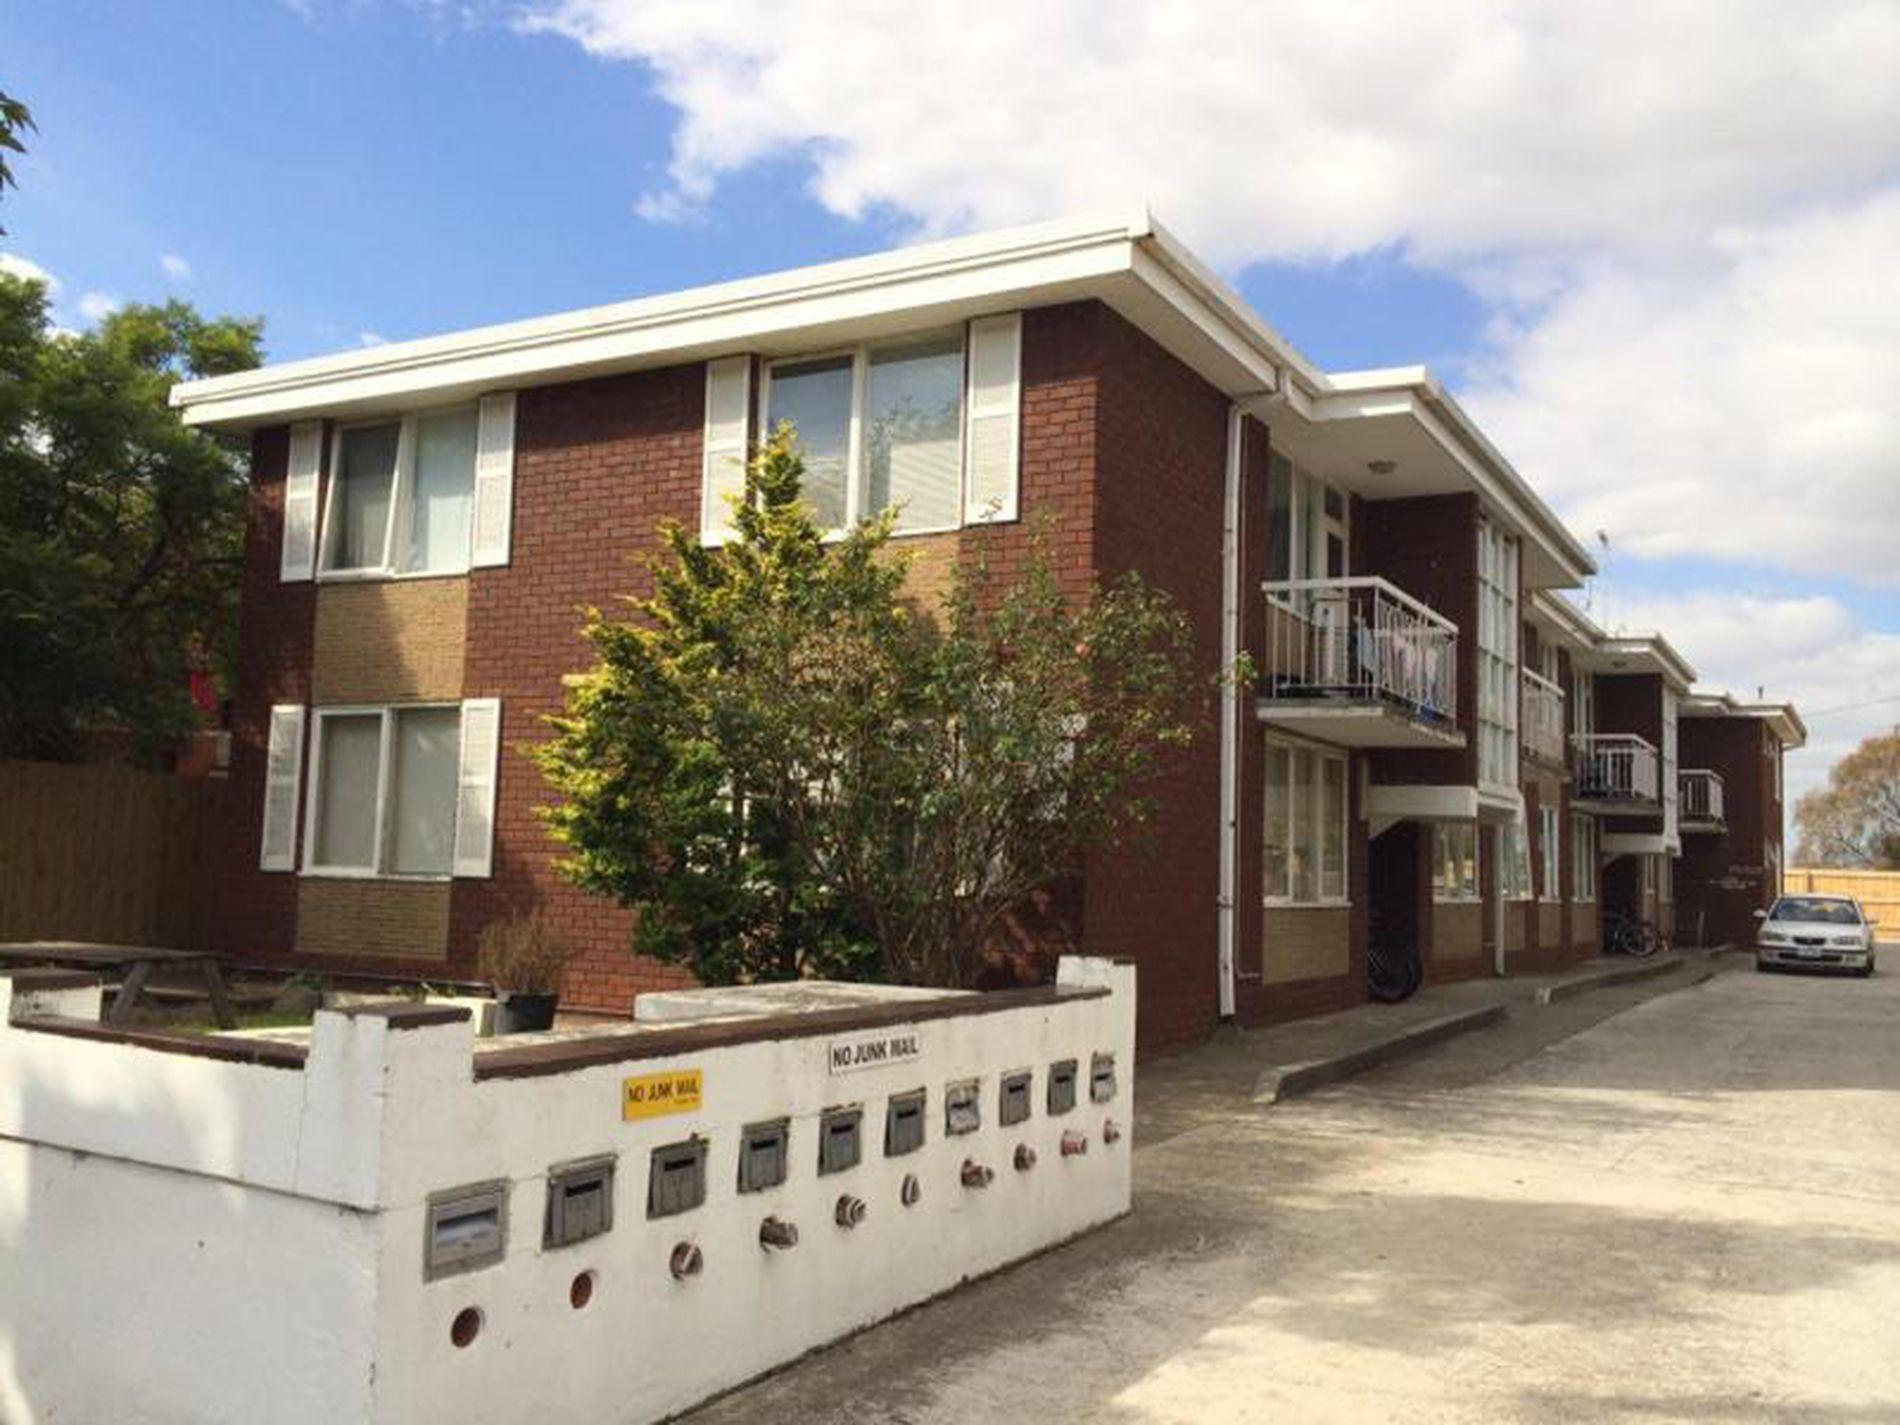 5 / 24 Eldridge Street, Footscray